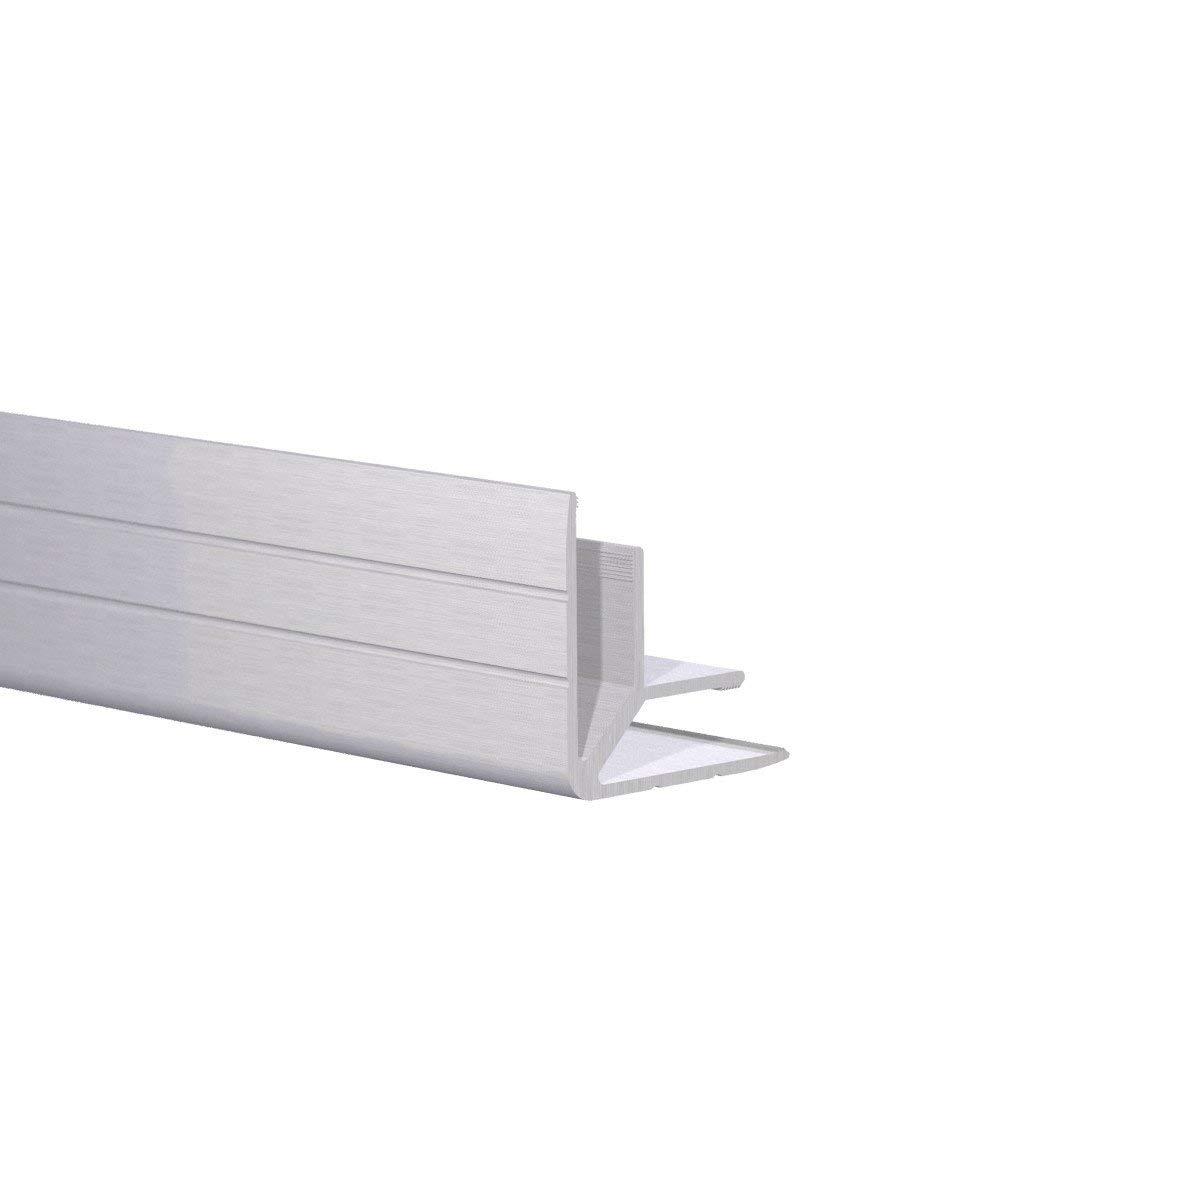 Orange Aluminum - Double Angle Edge (Fits 1/4'' Material) by Orange Aluminum